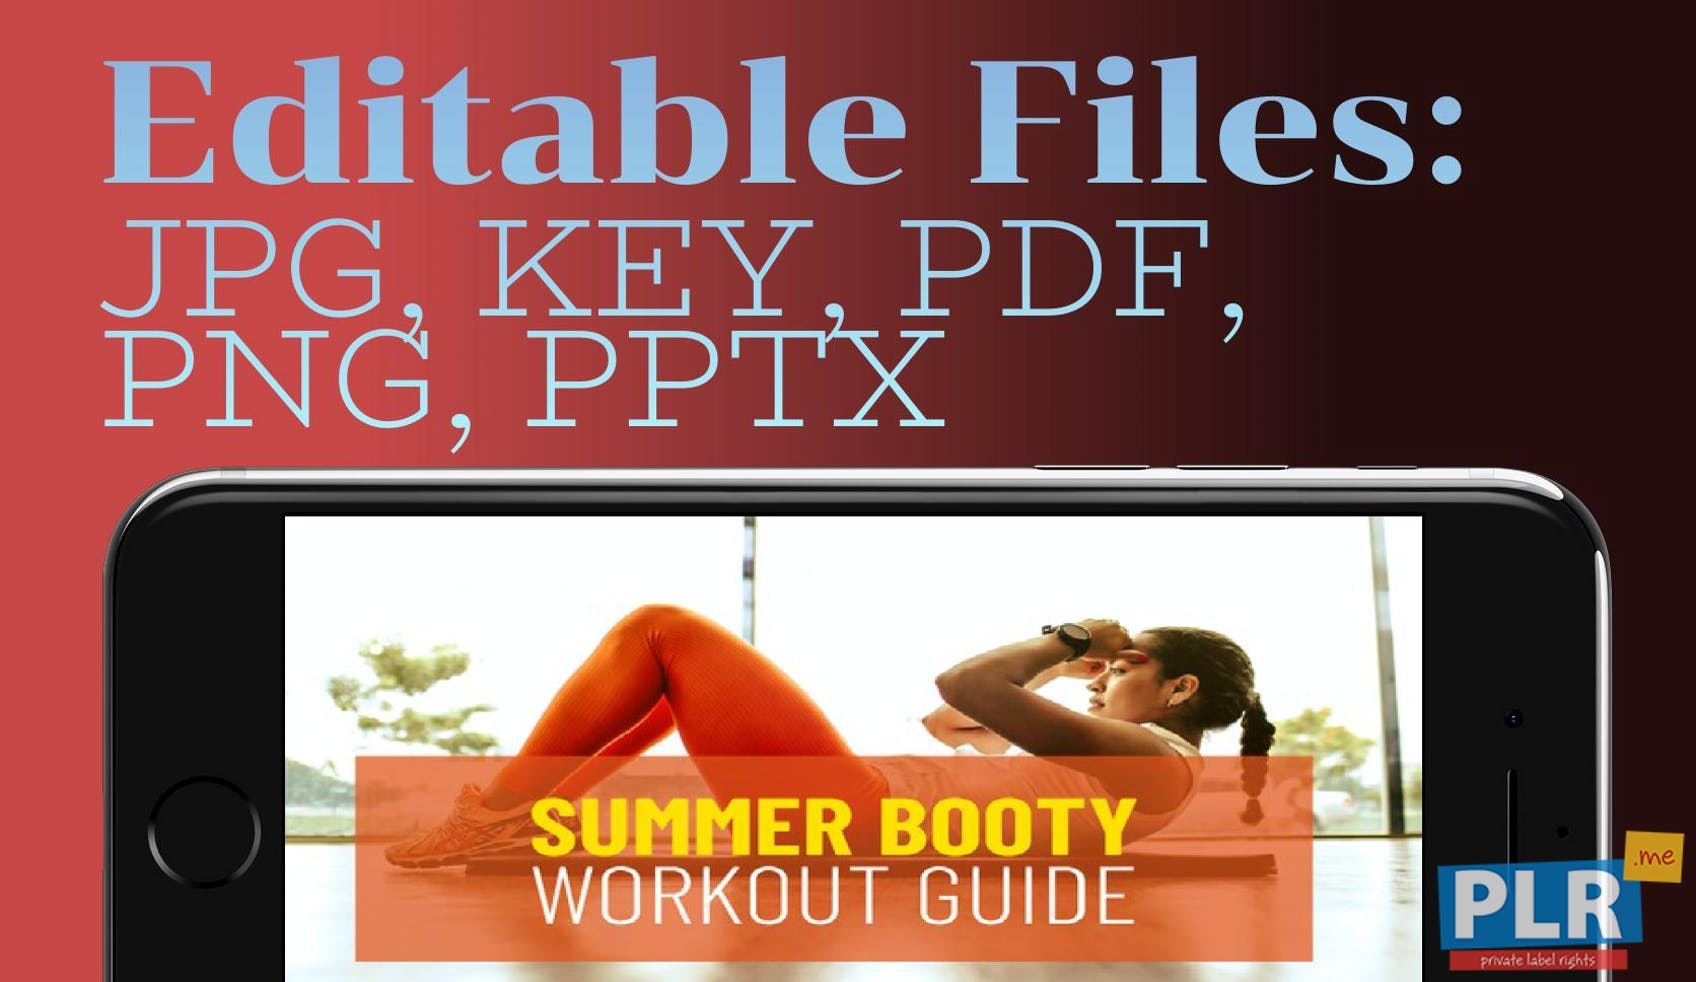 Summer Booty Workout Guide Slide Deck